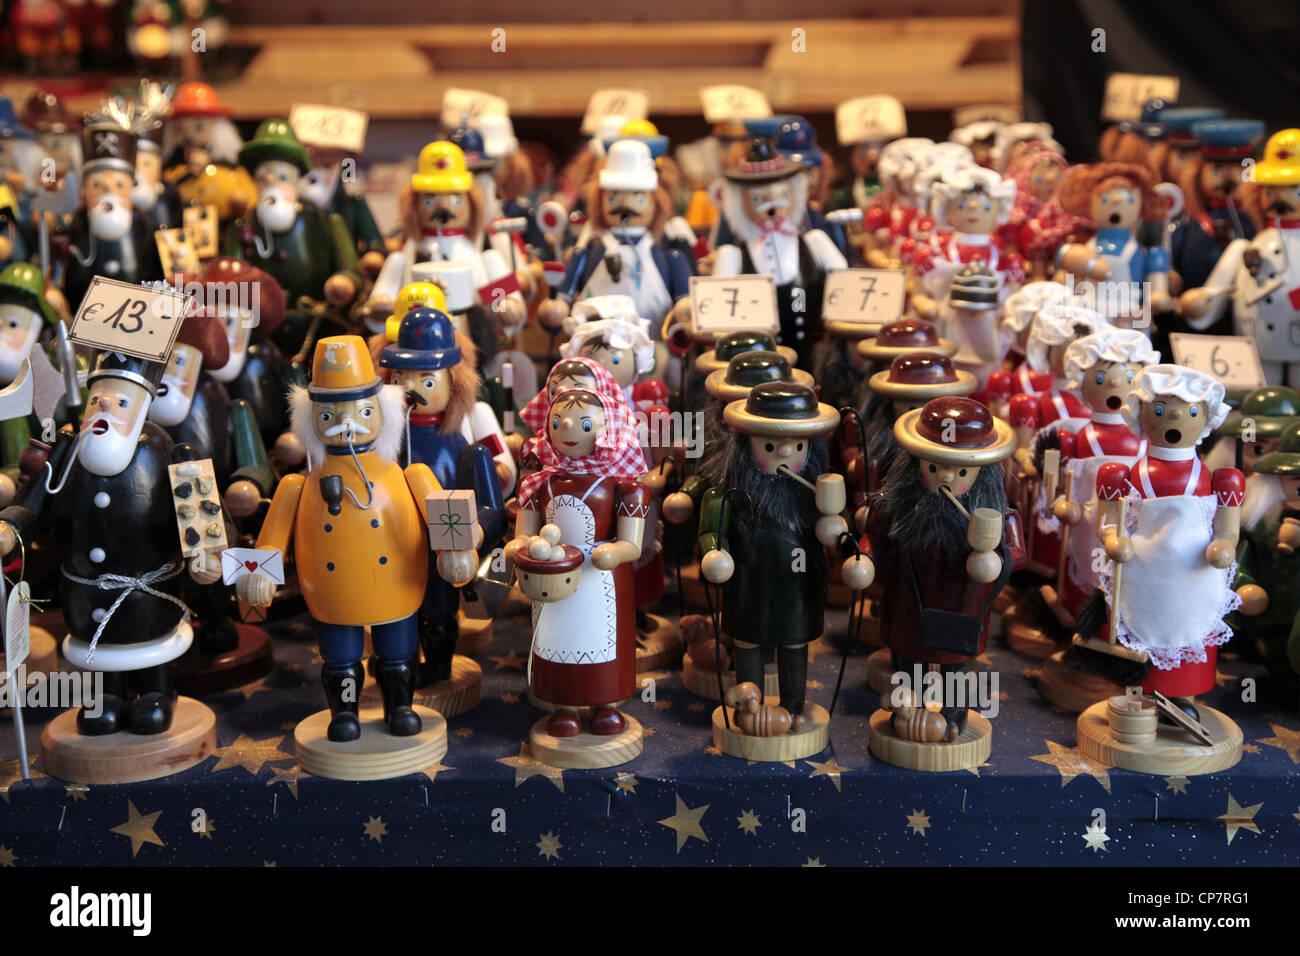 WOODEN CHRISTMAS ORNAMENTS SALZBURG AUSTRIA 27 December 2011 - Stock Image